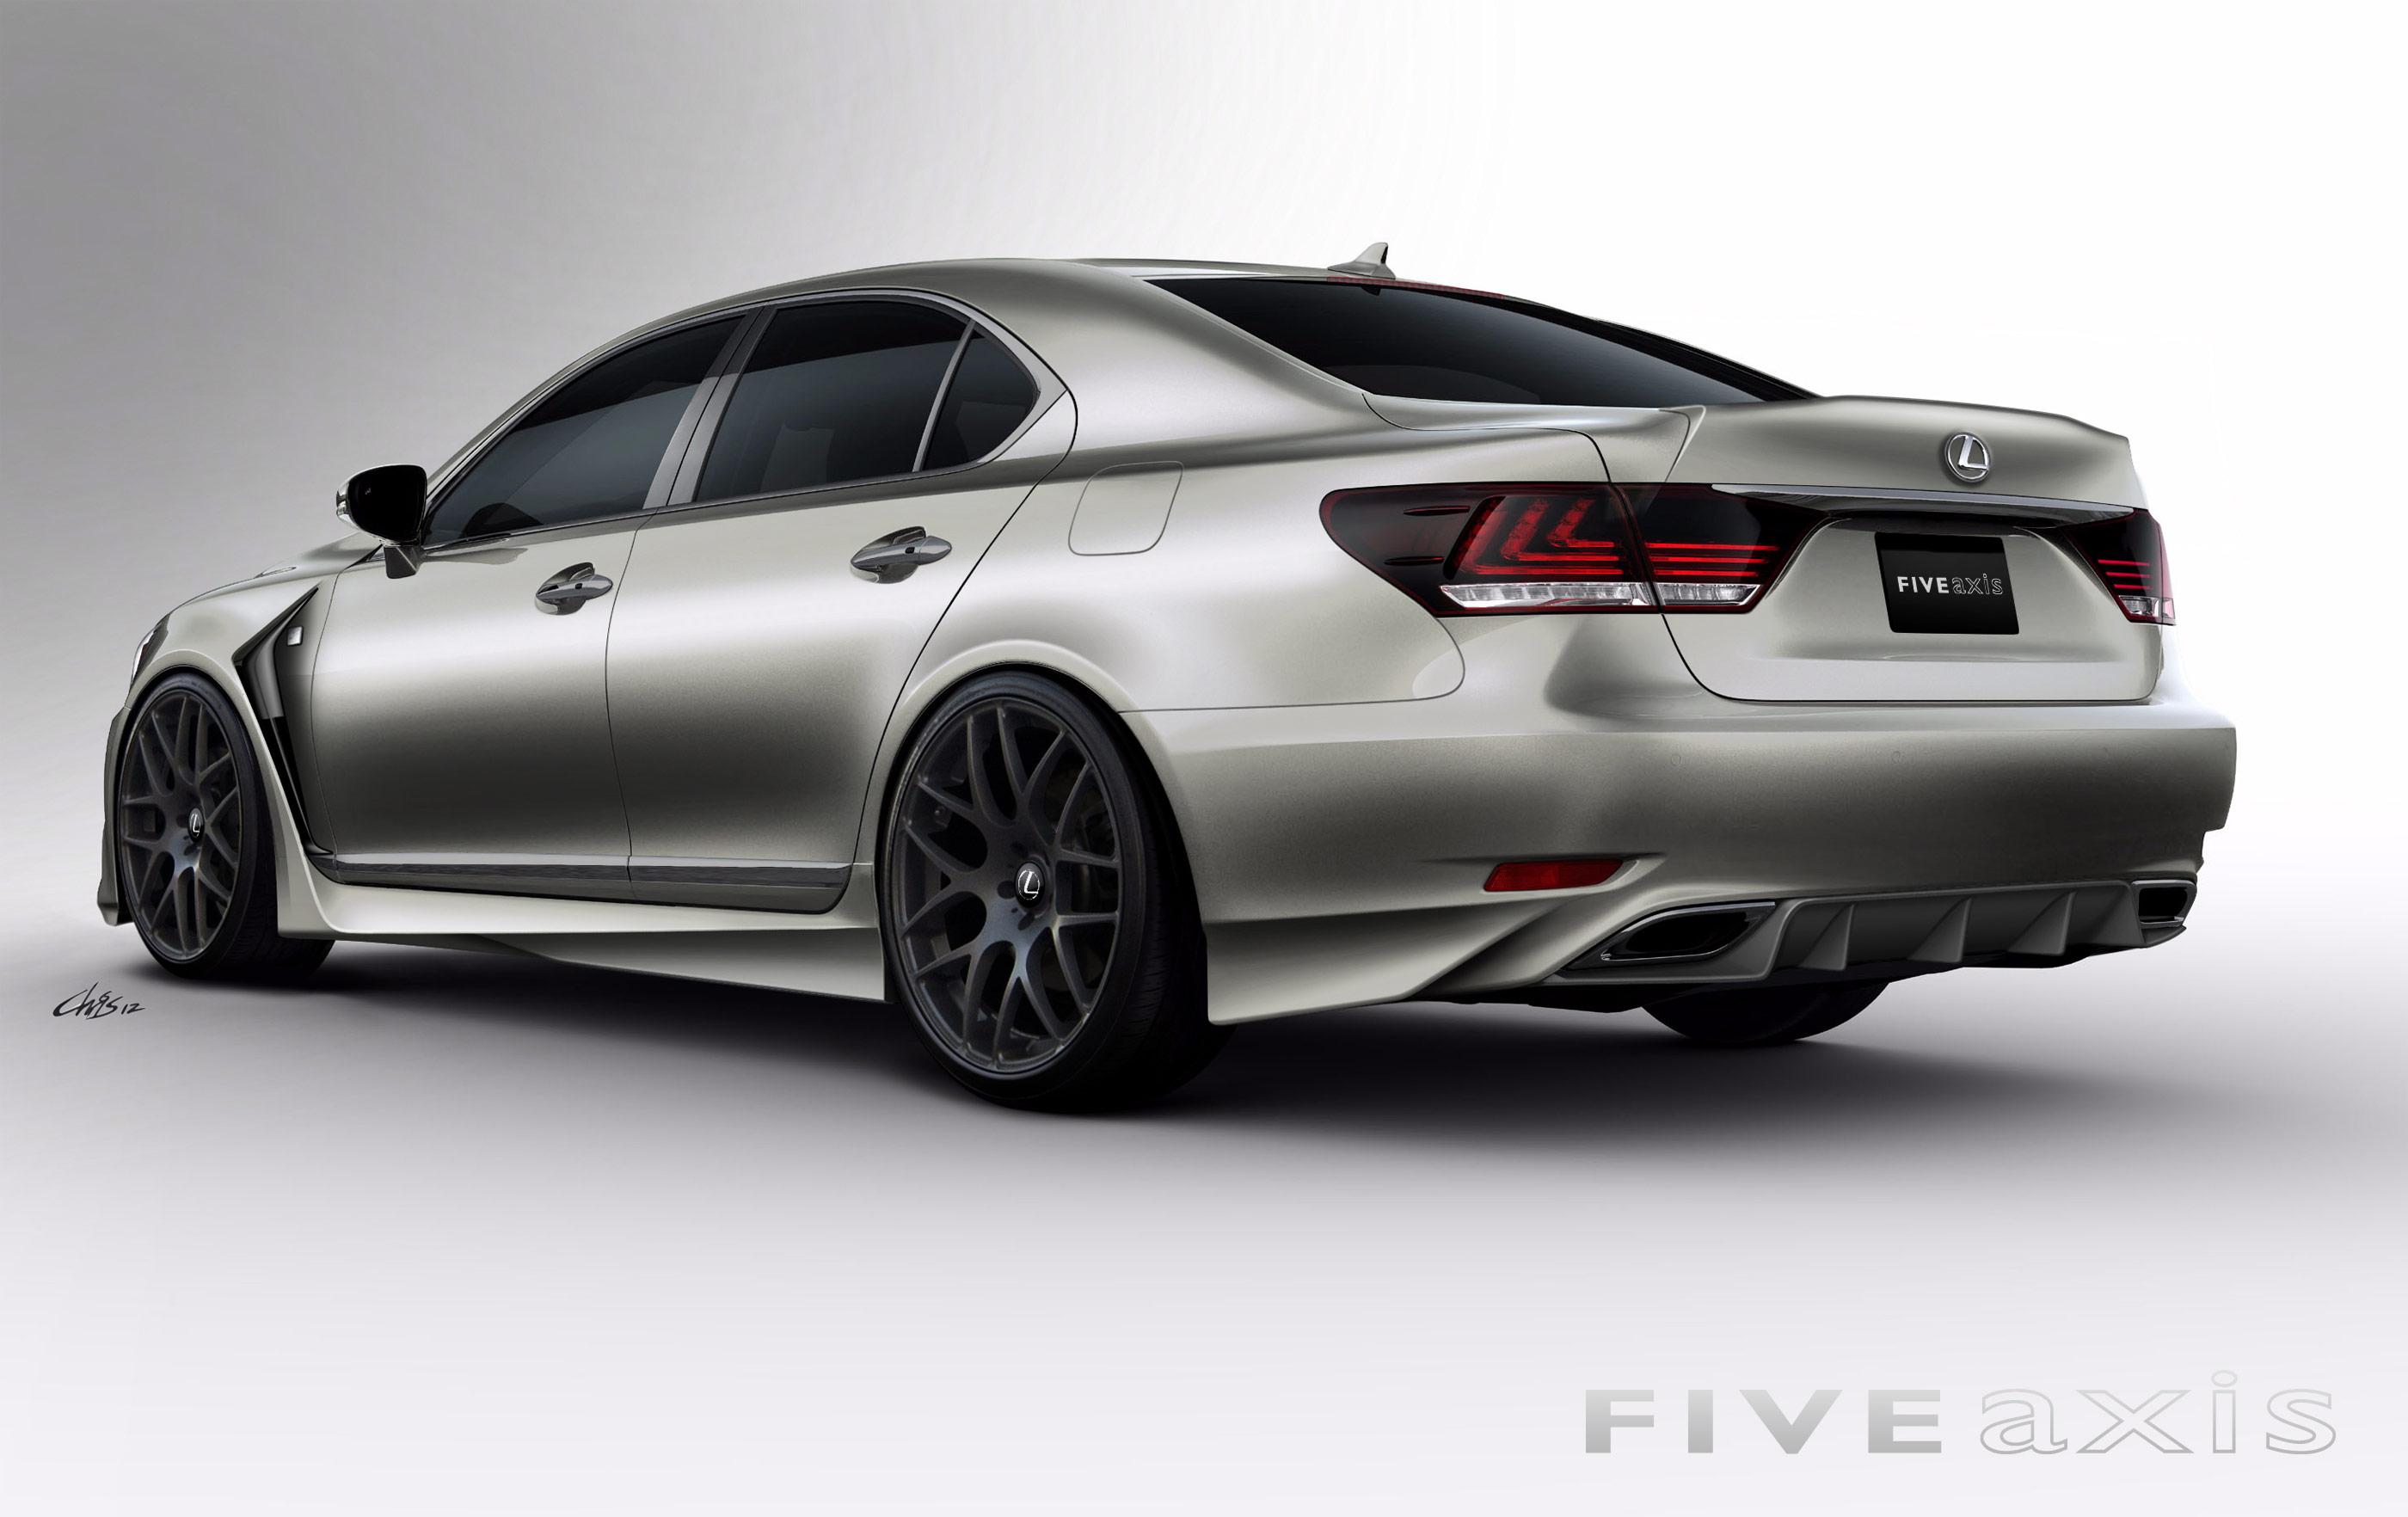 Sema 2012 Project Lexus Ls F Sport By Five Axis Lexus